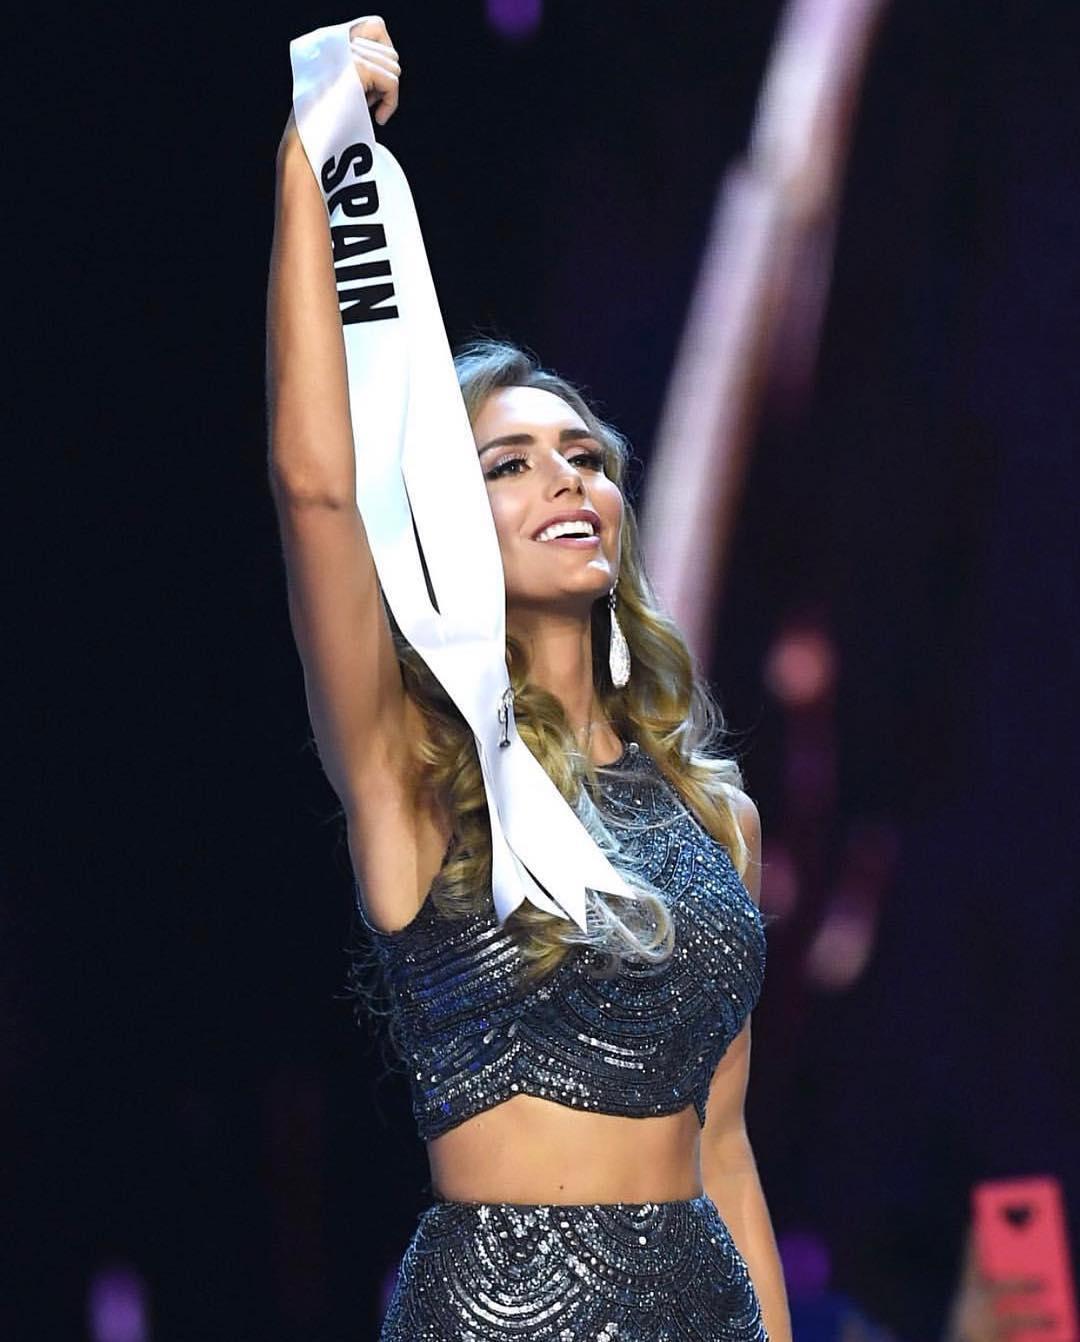 angela ponce, miss espana universo 2018. - Página 18 Kfkt6y10